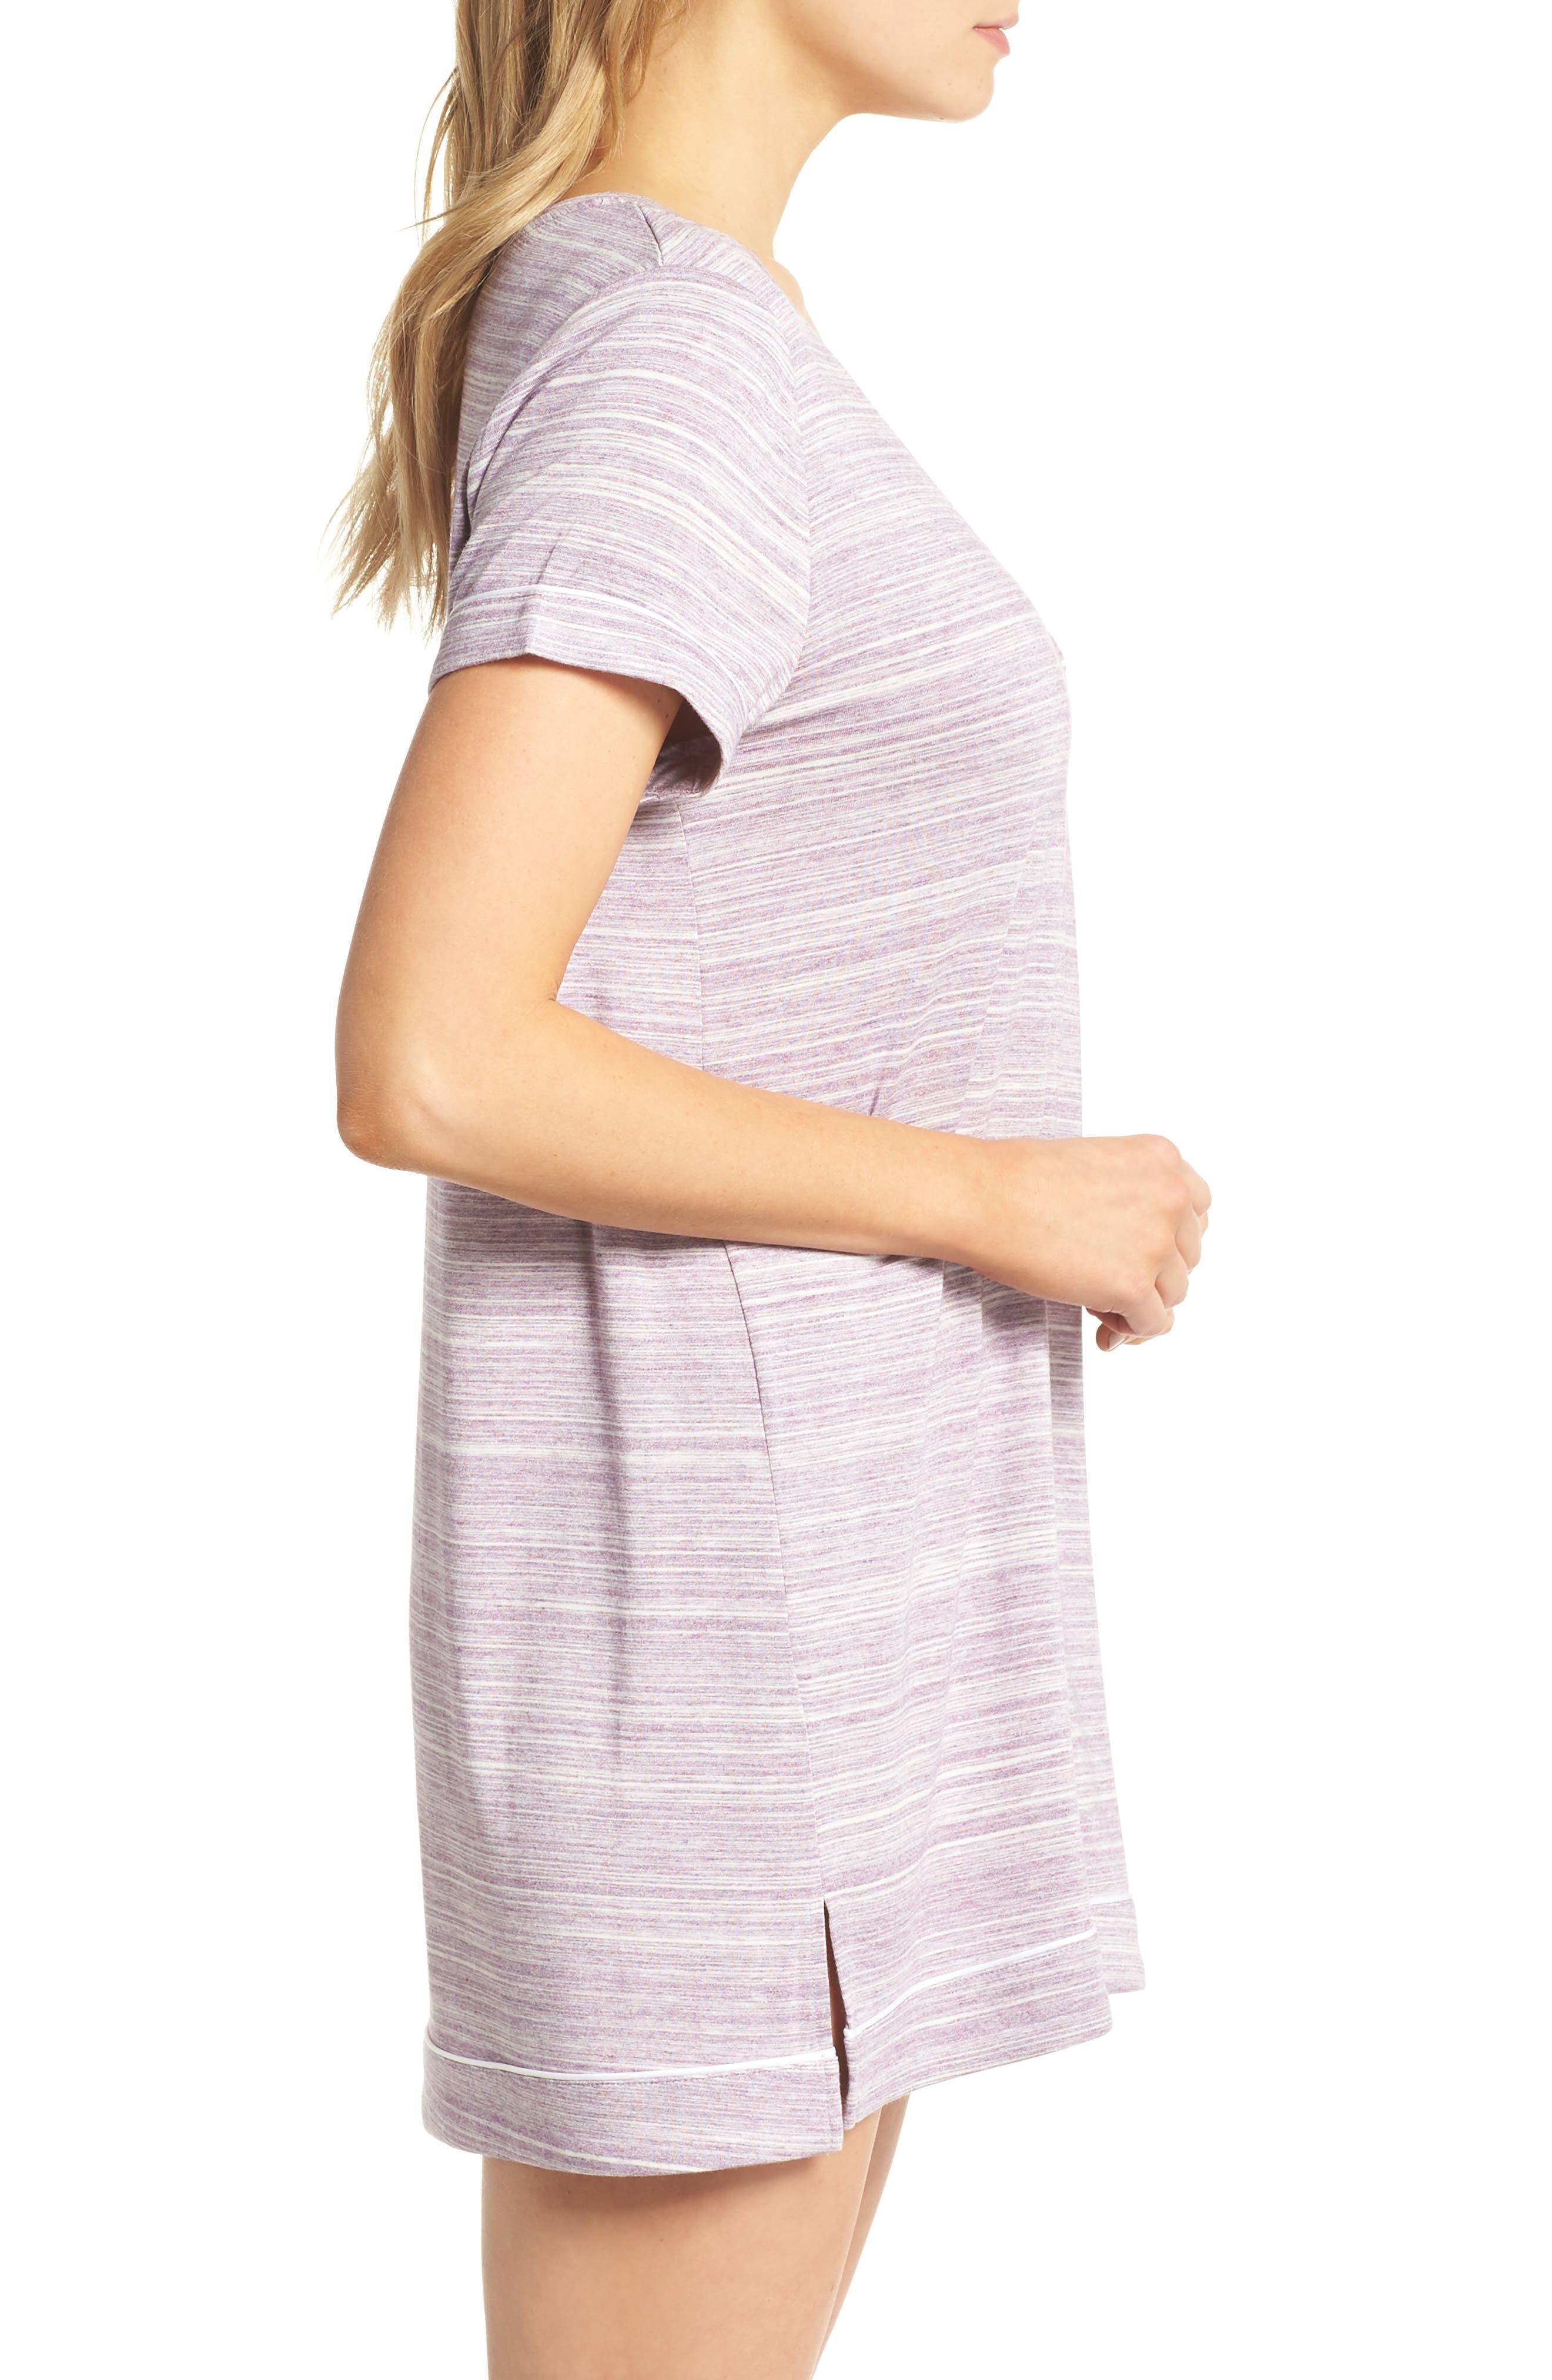 Moonlight Sleep Shirt,                             Alternate thumbnail 3, color,                             Purple Spacedye